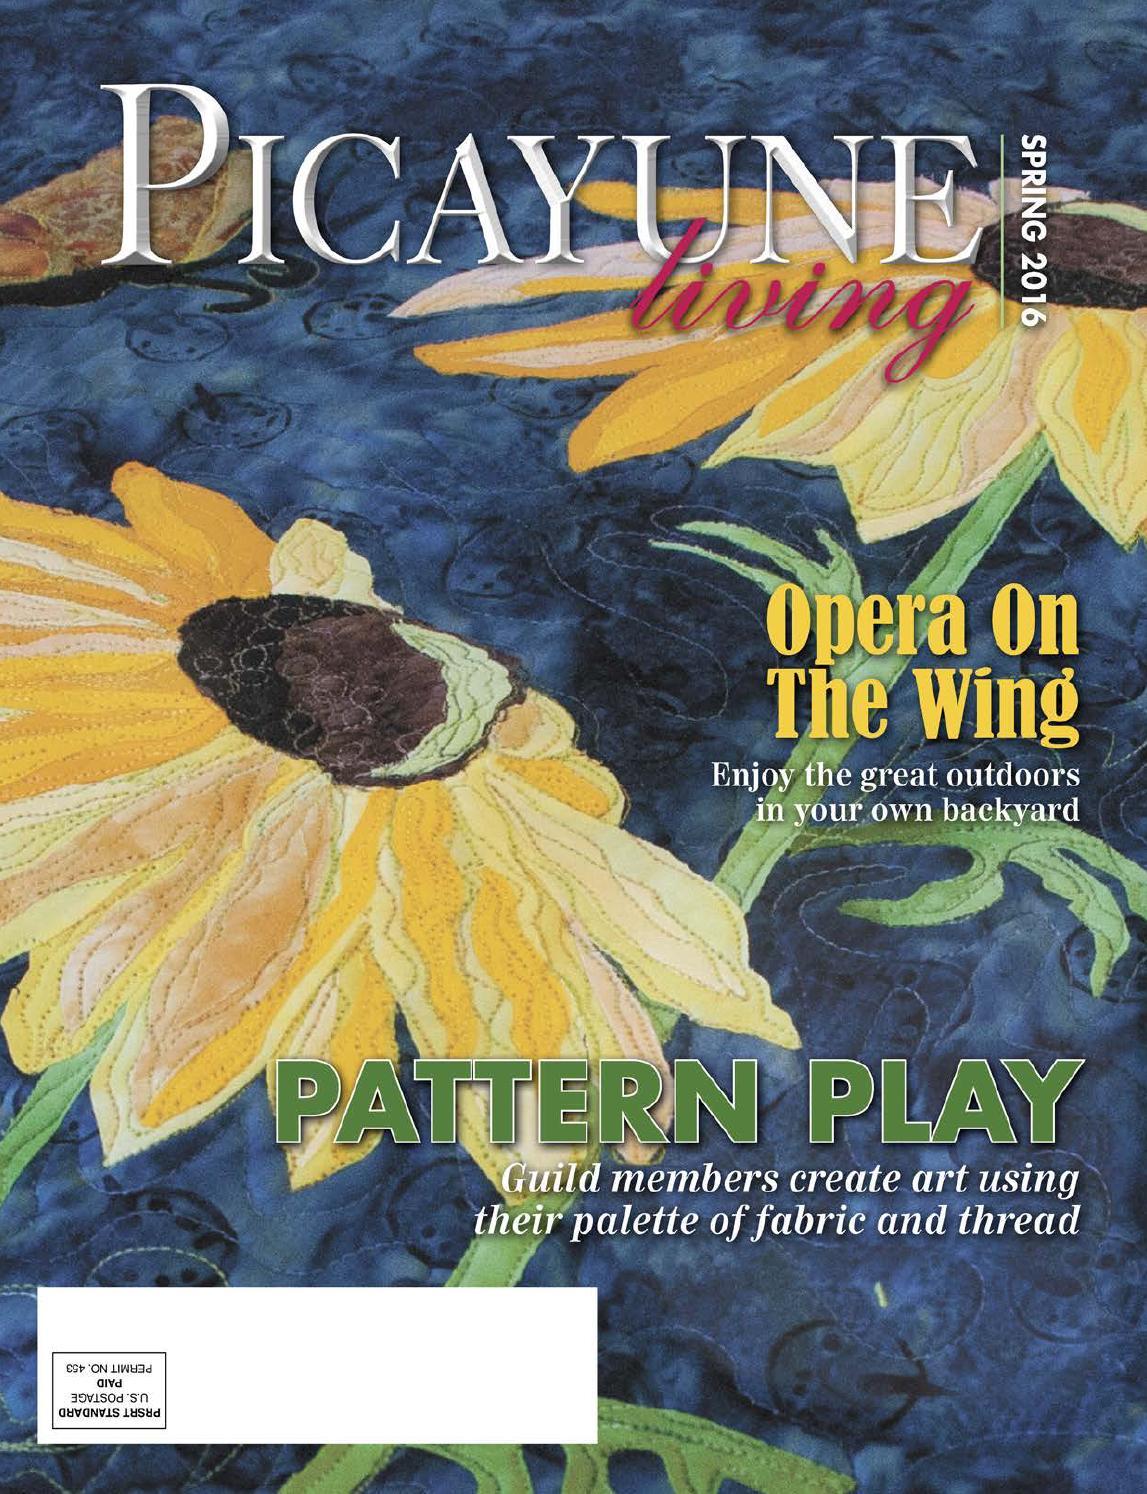 picayune living magazine by picayune item issuu